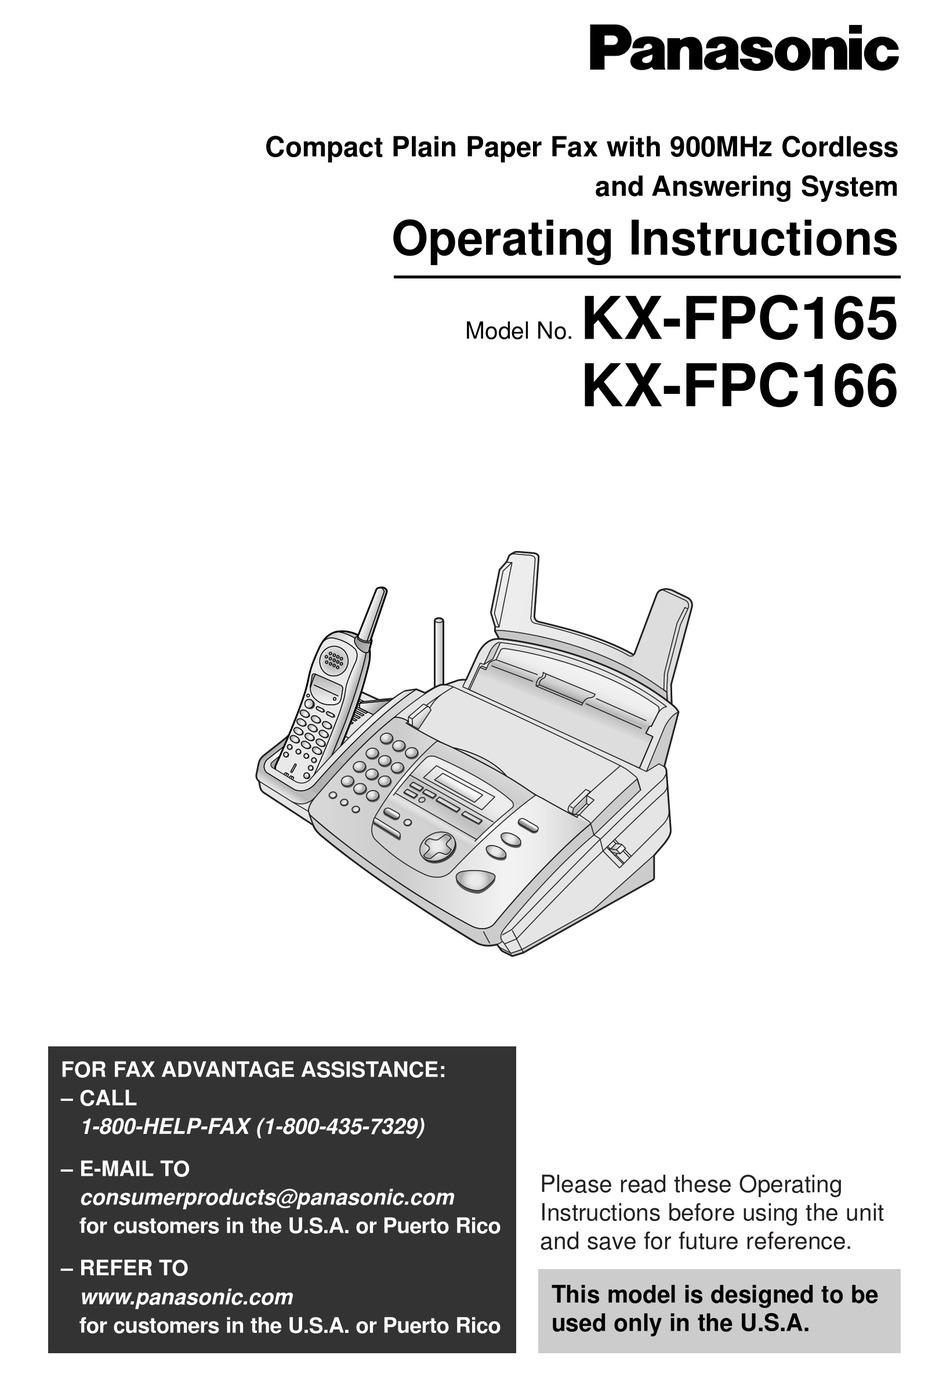 PANASONIC KX-FPC165 OPERATING INSTRUCTIONS MANUAL Pdf